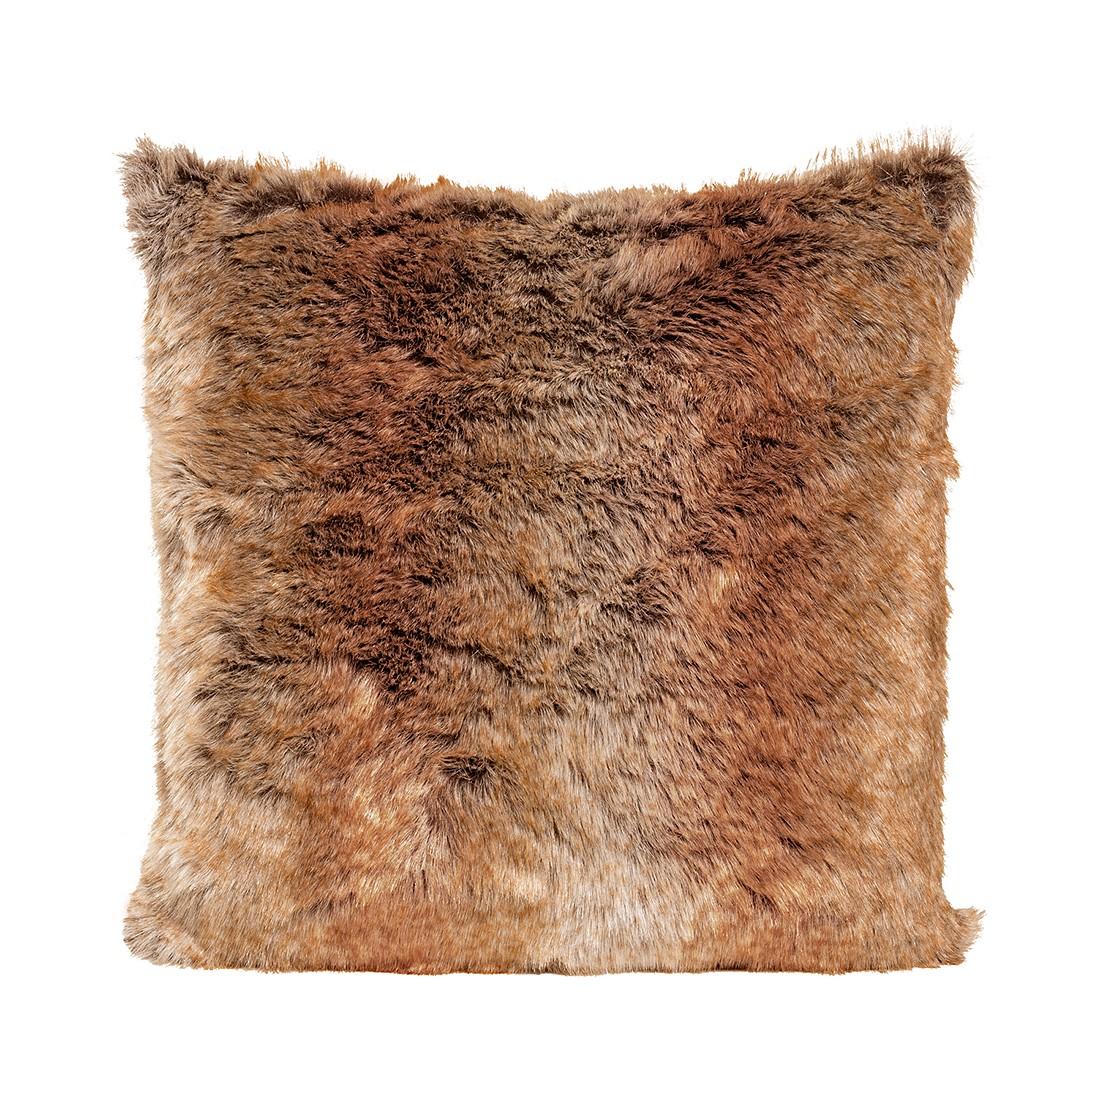 Kissenhülle Winterfell – Braun – 40 x 40 cm, Magma-Heimtex jetzt kaufen